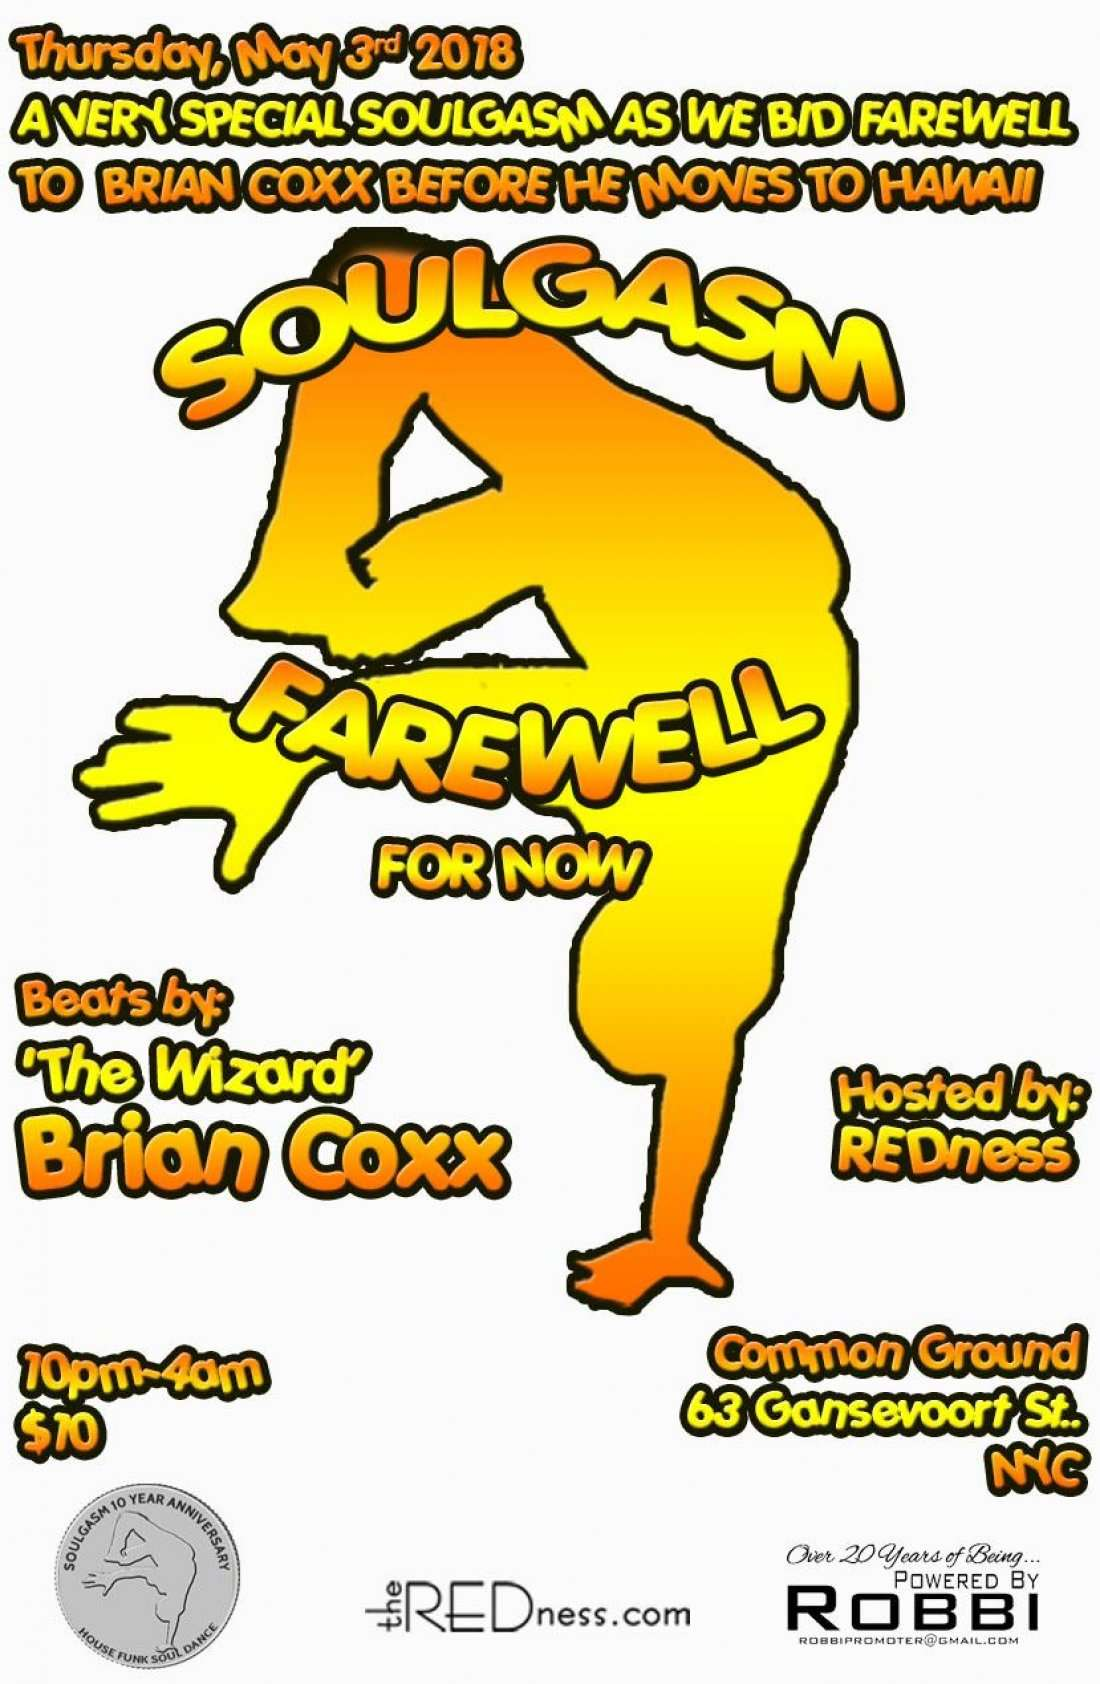 Soulgasm-NYC Finale-Farewell & Aloha DJ Brian Coxx